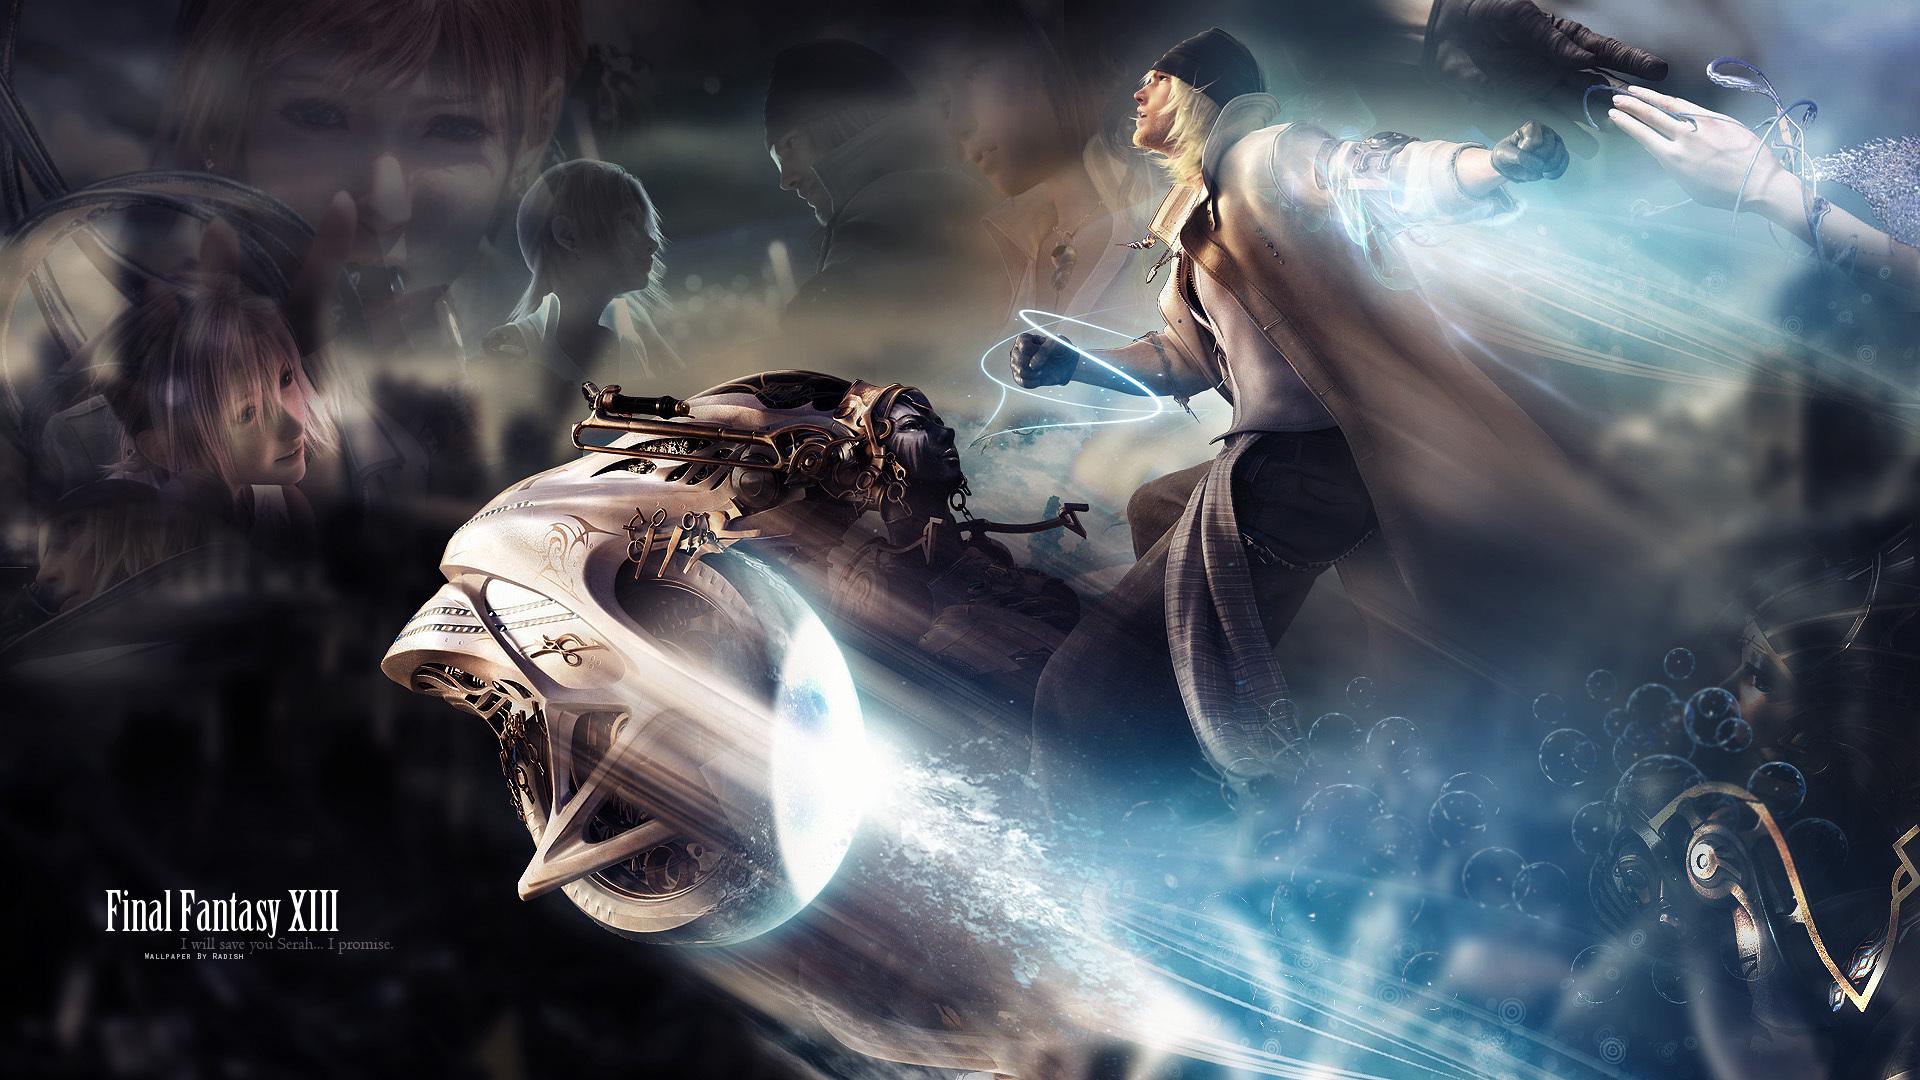 Final Fantasy Xv Logo Uhd 4k Wallpaper: Final Fantasy XIII Fond D'écran HD